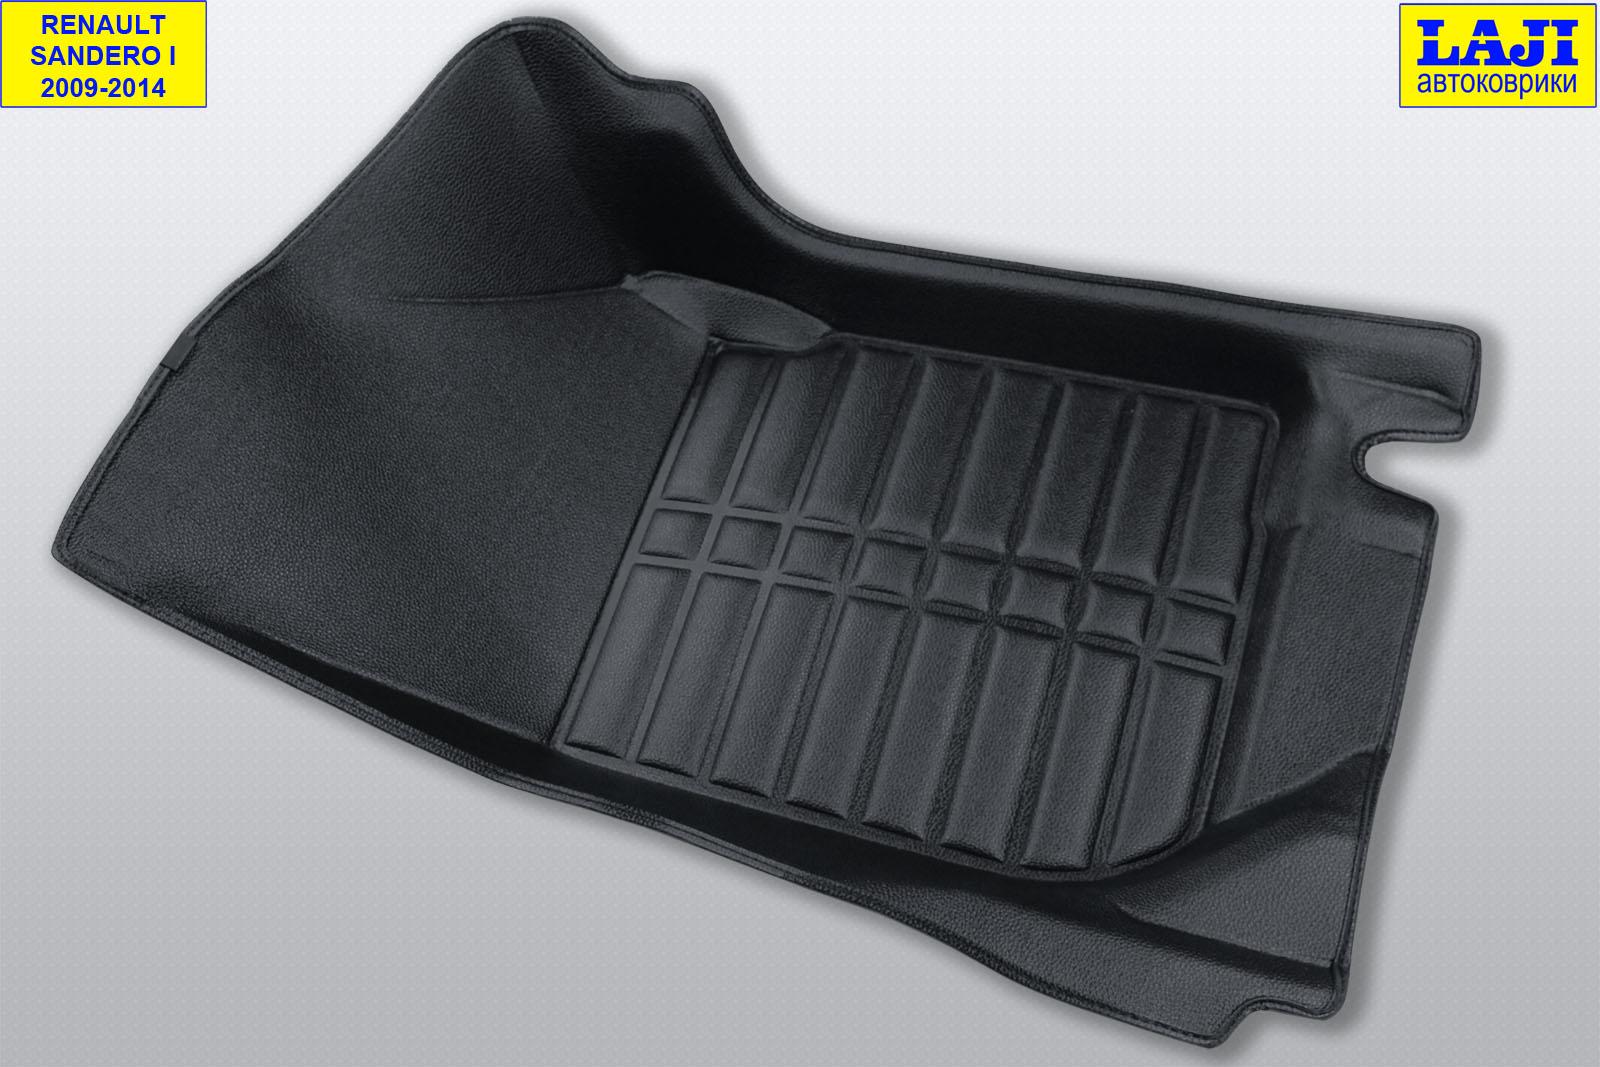 5D коврики в салон Renault Sandero 1 2009-2014 4